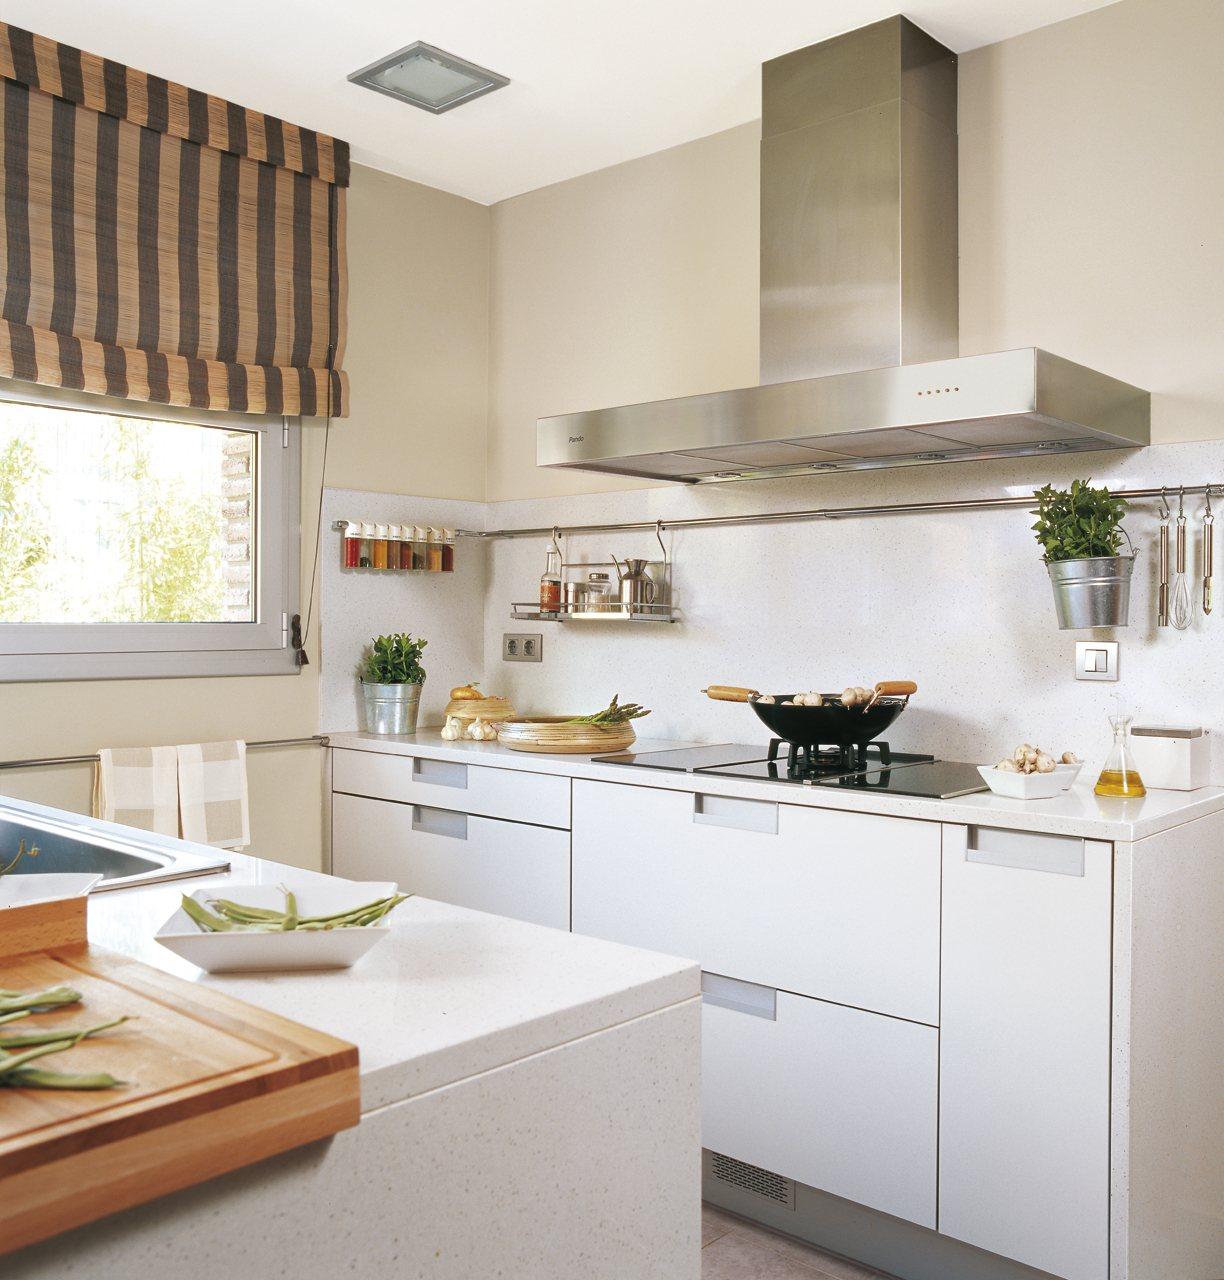 Renovar la cocina sin obras - Renovar cocinas sin obras ...